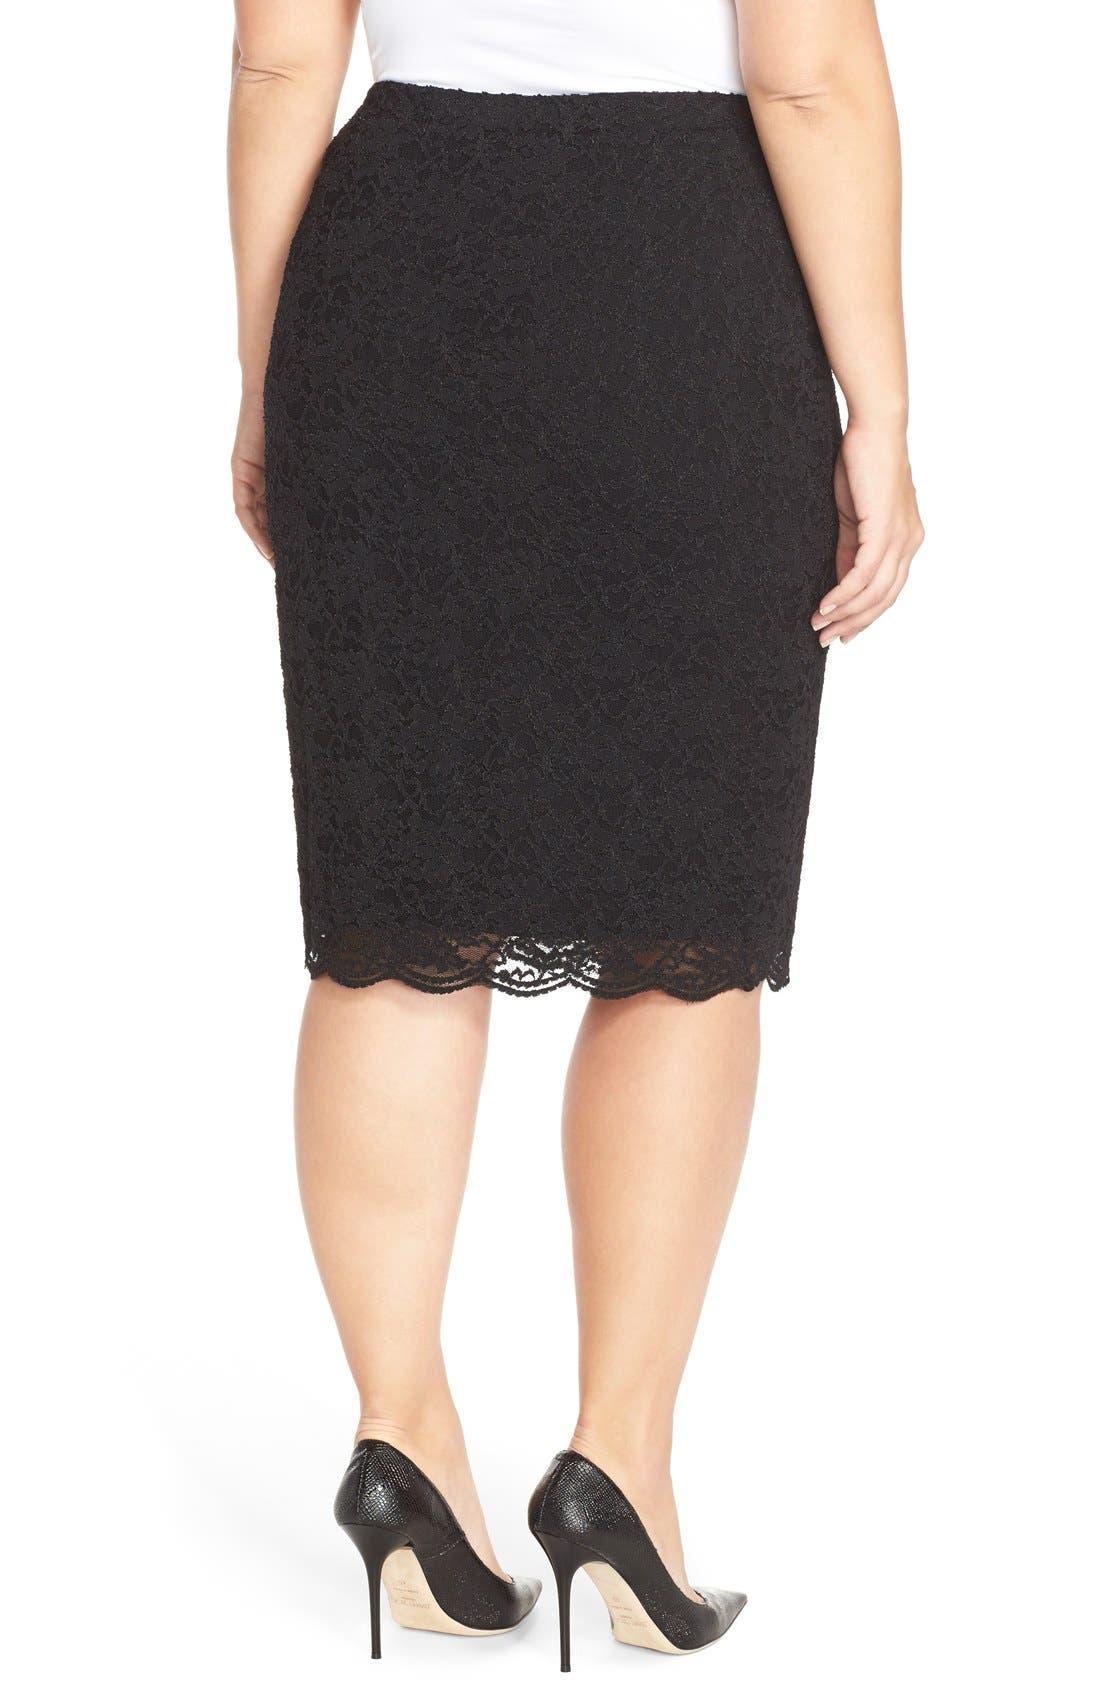 Alternate Image 2  - Vince Camuto Stretch Lace Pencil Skirt (Plus Size)